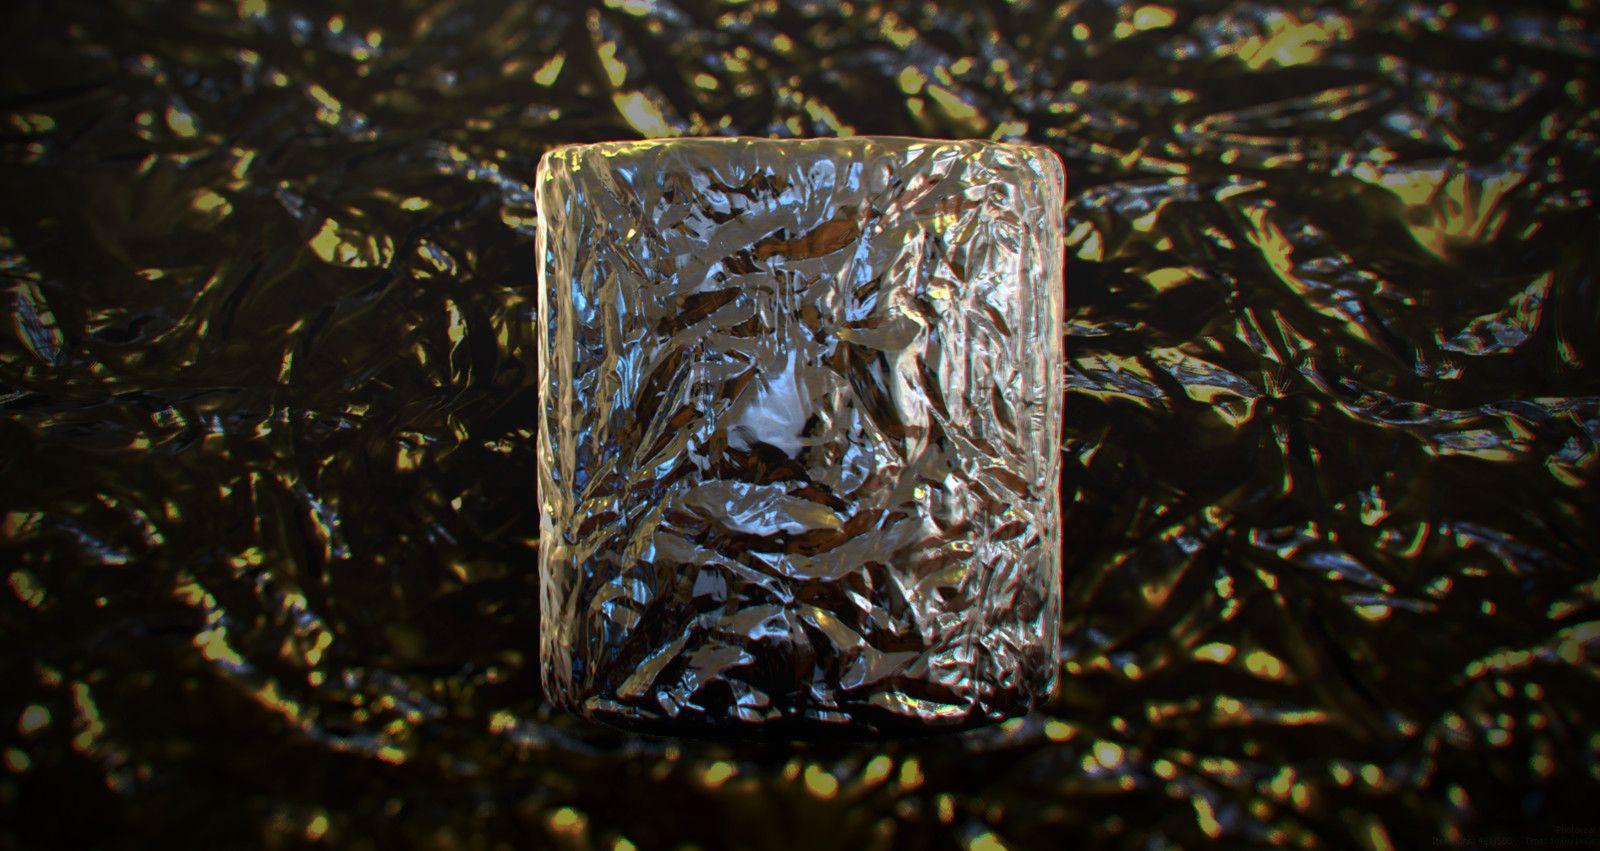 Crumbled Aluminum Foil, Pim Hendriks on ArtStation at https://www.artstation.com/artwork/arX2R